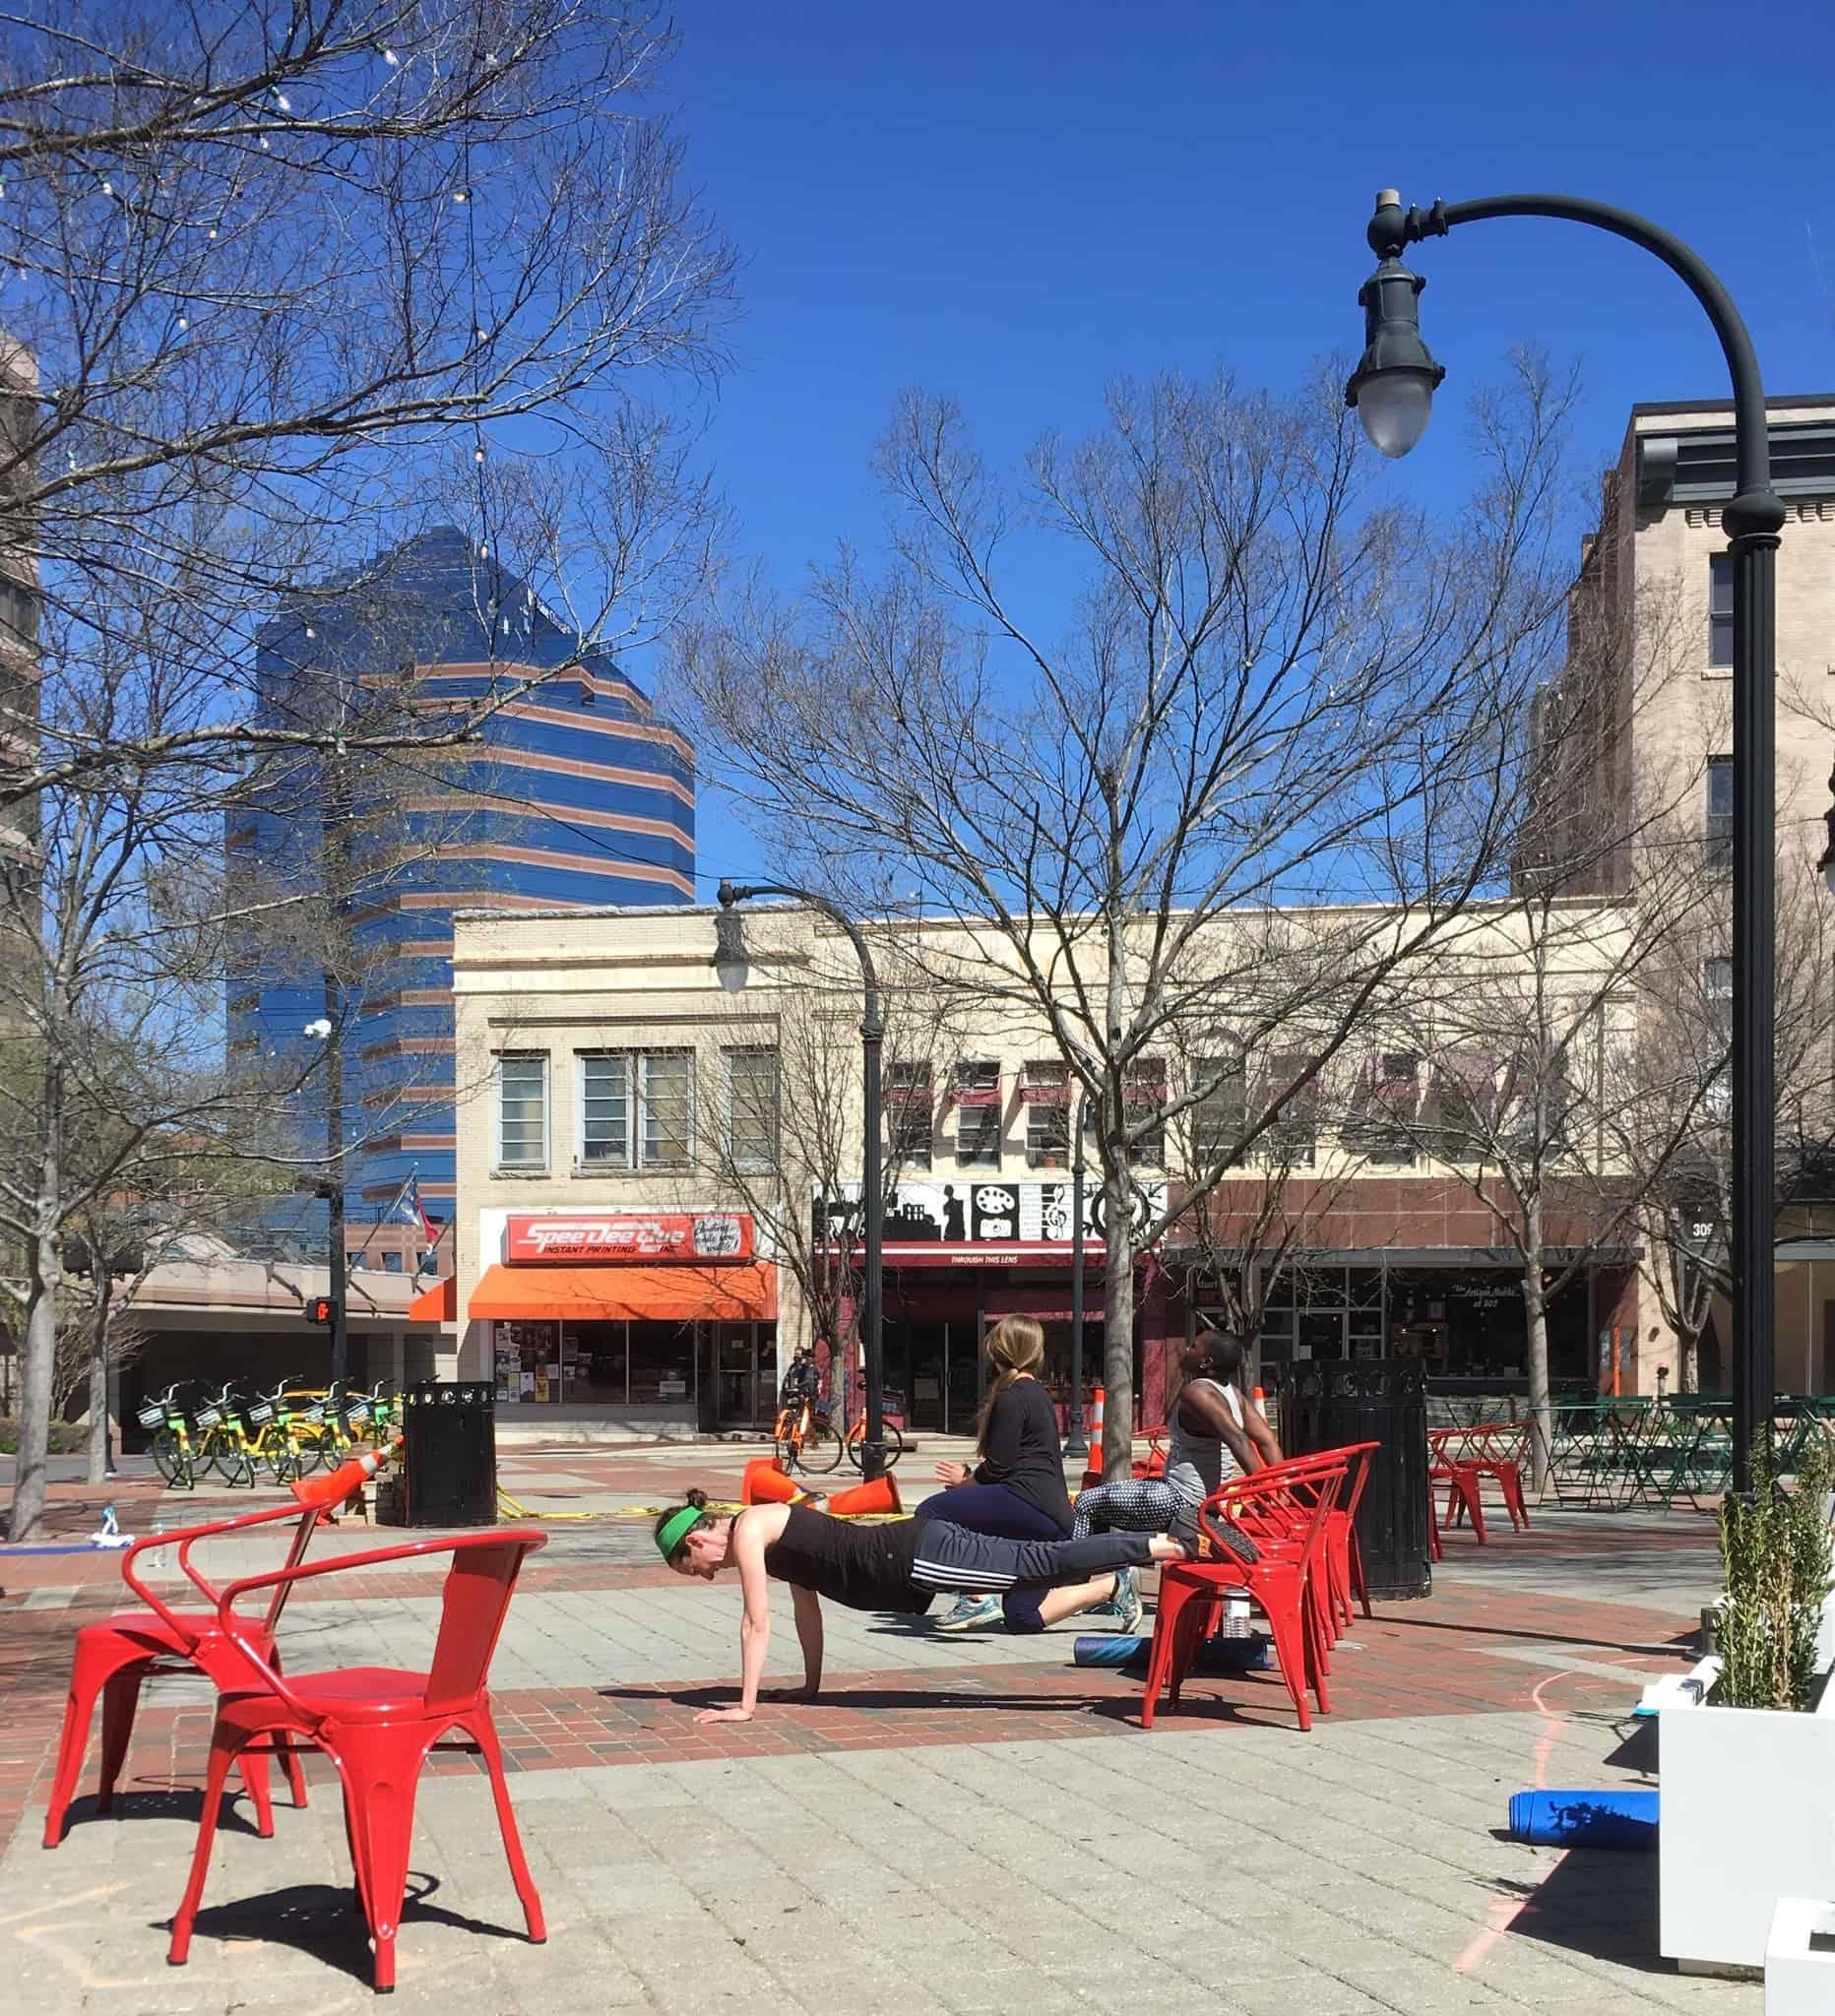 workout, push ups at Durham Bull plaza